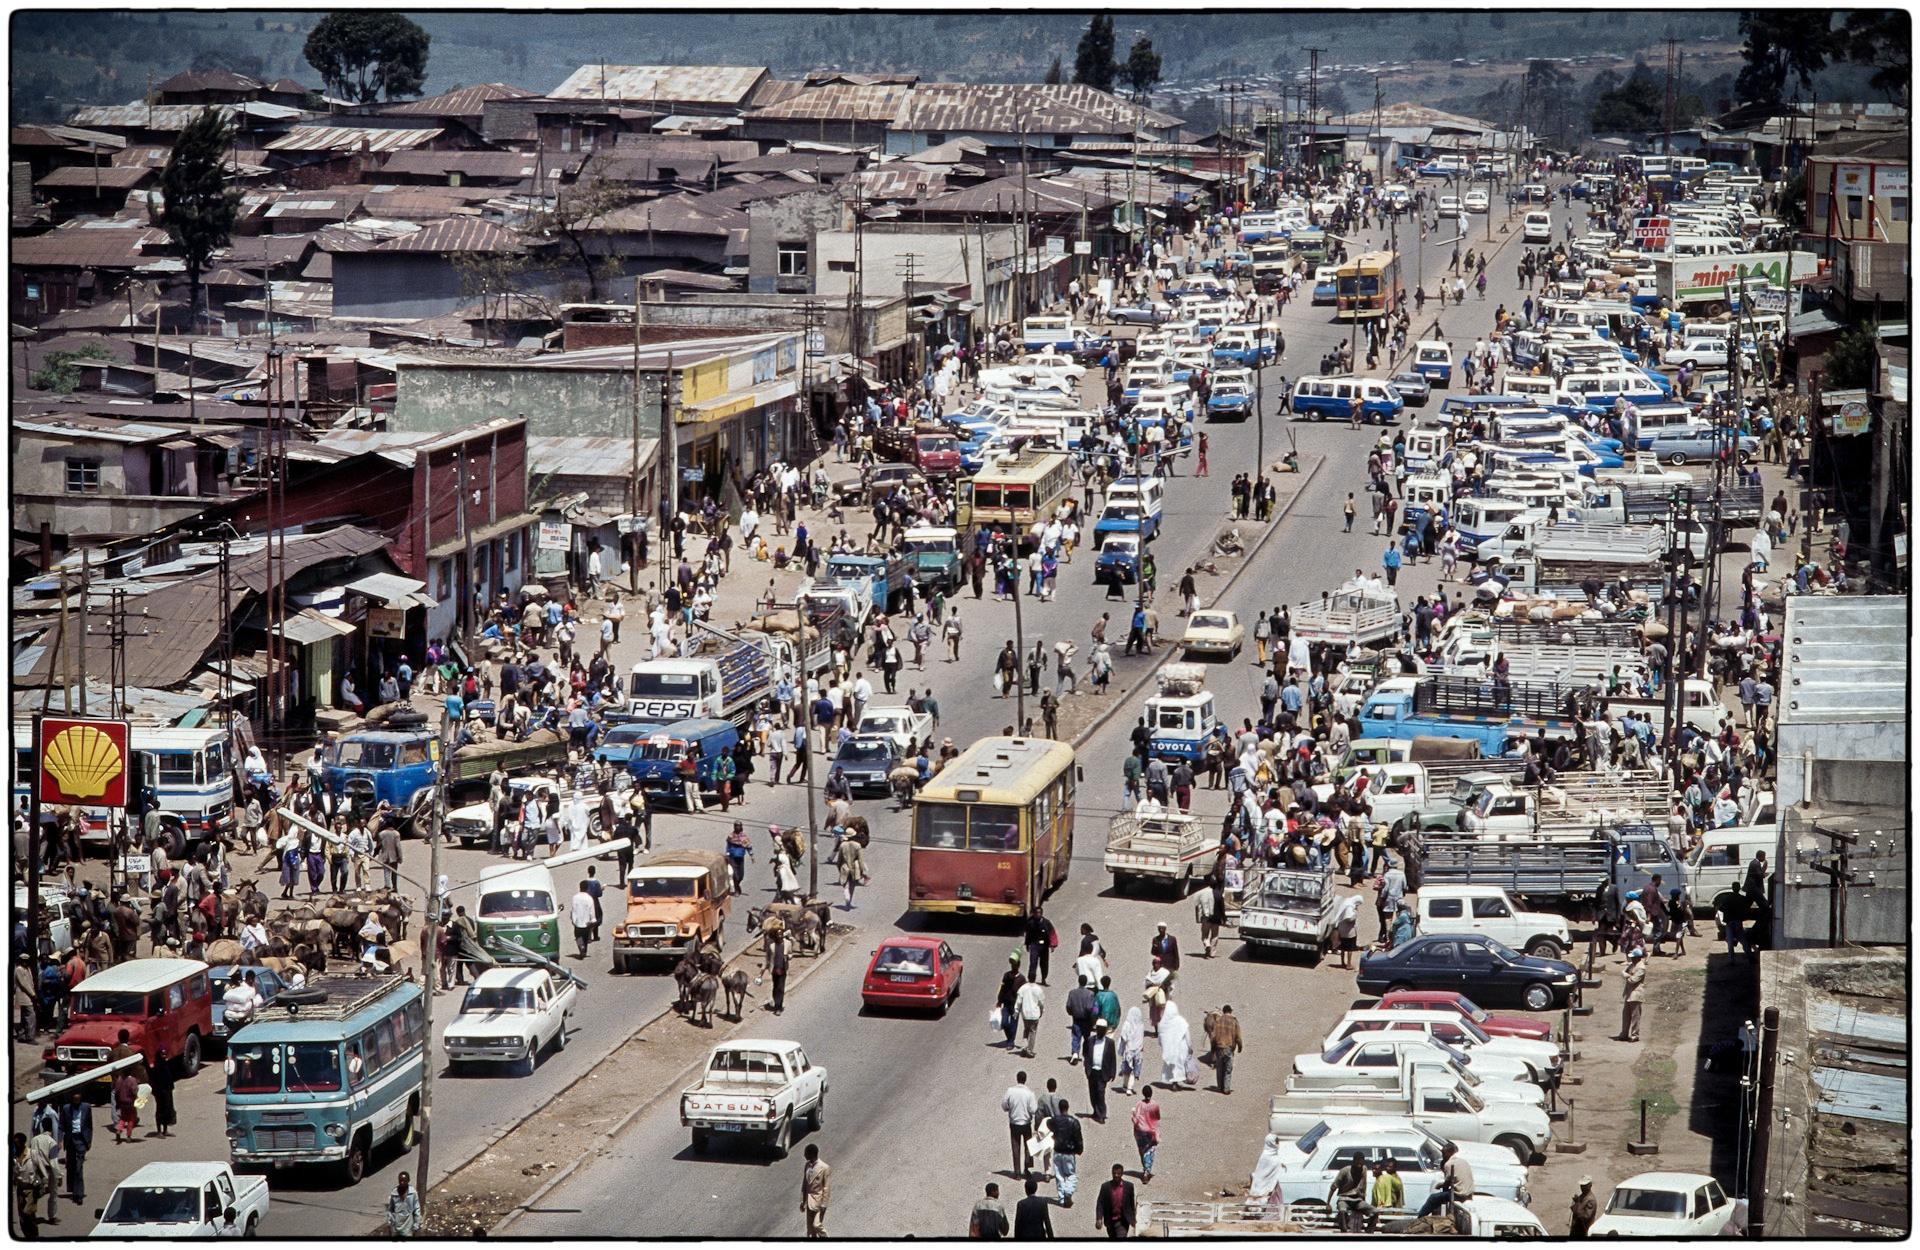 1993 Addis Ababa by Richard Hanson